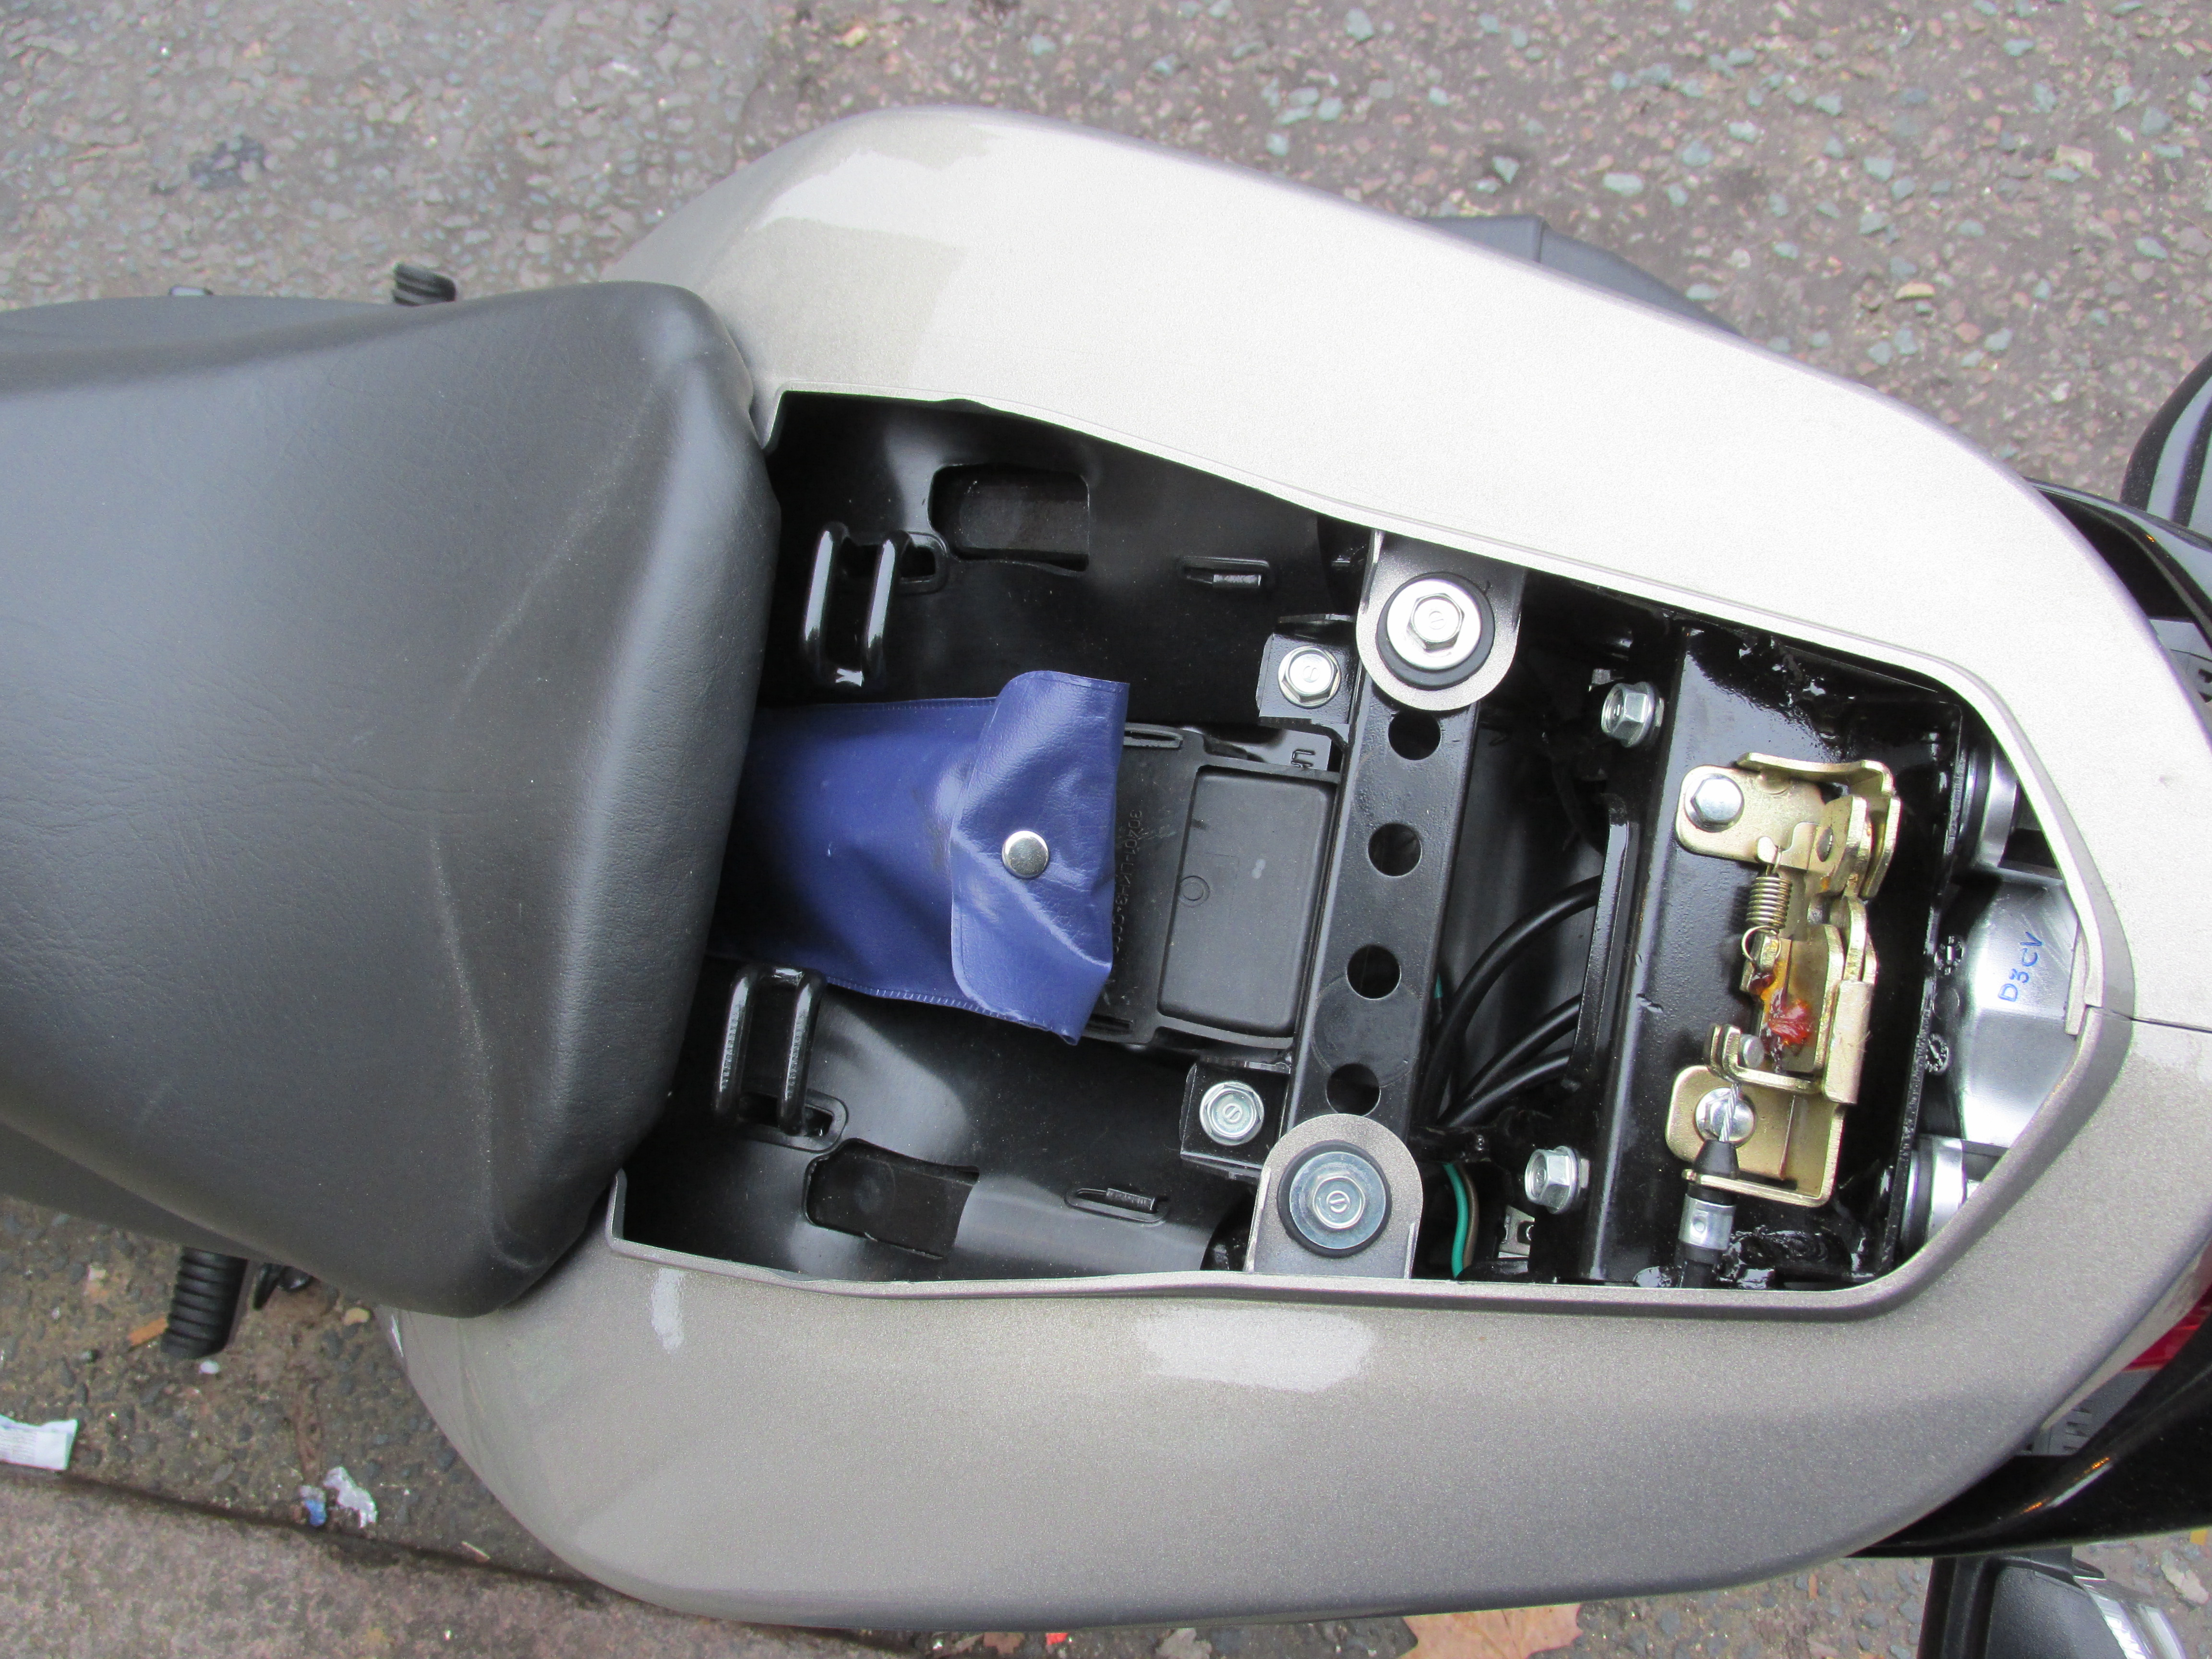 Kymco CK1 125 UK road test